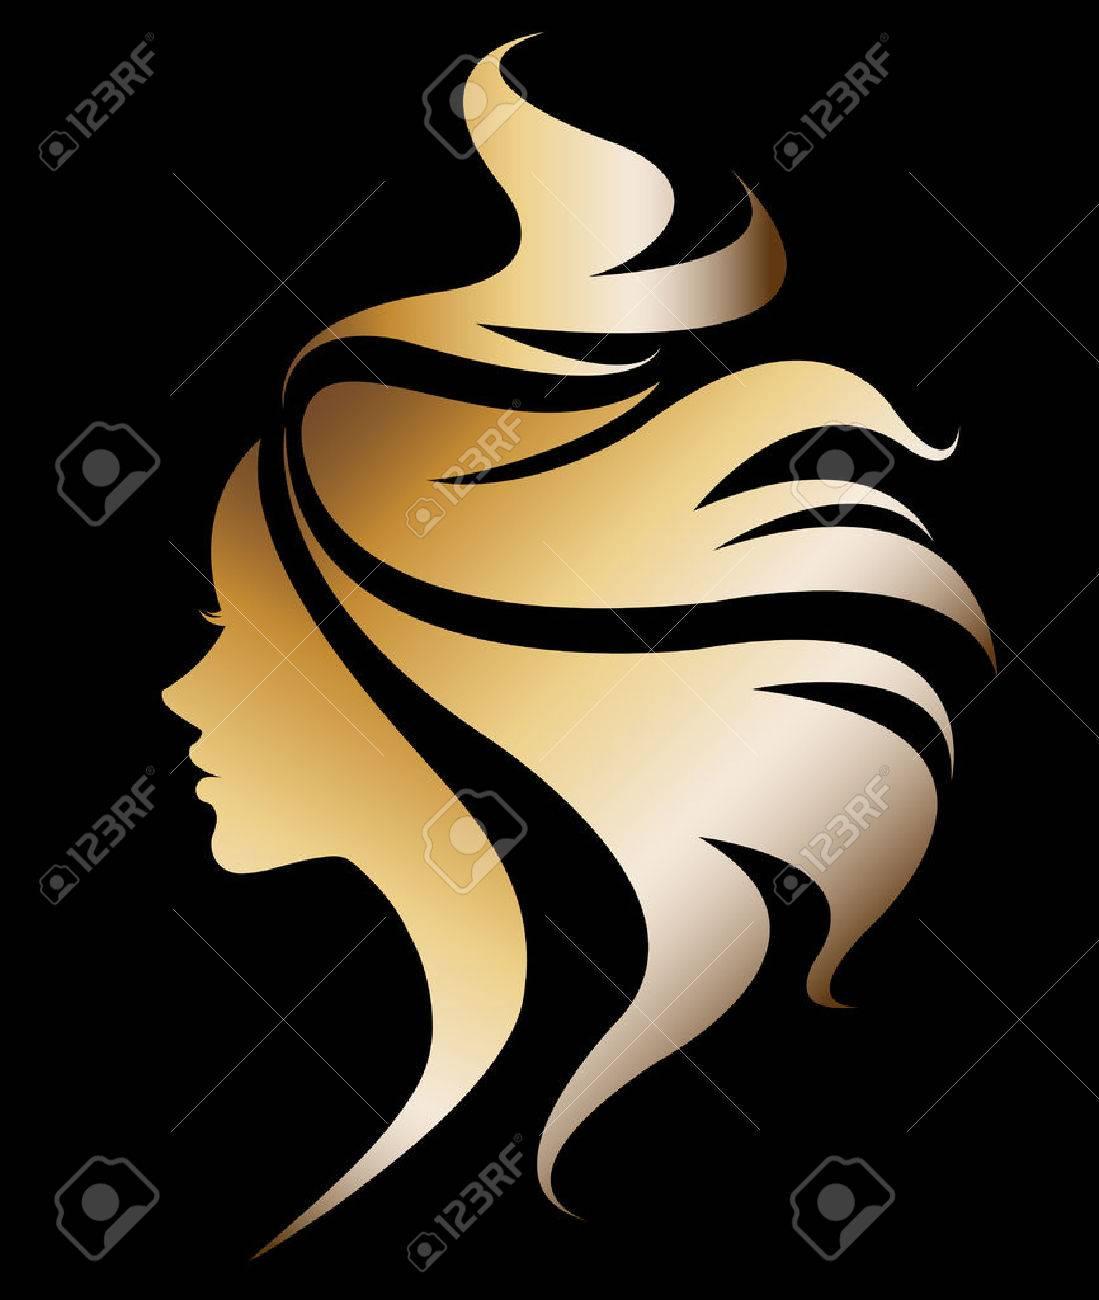 illustration vector of women silhouette golden icon, women face logo on black background - 62776404